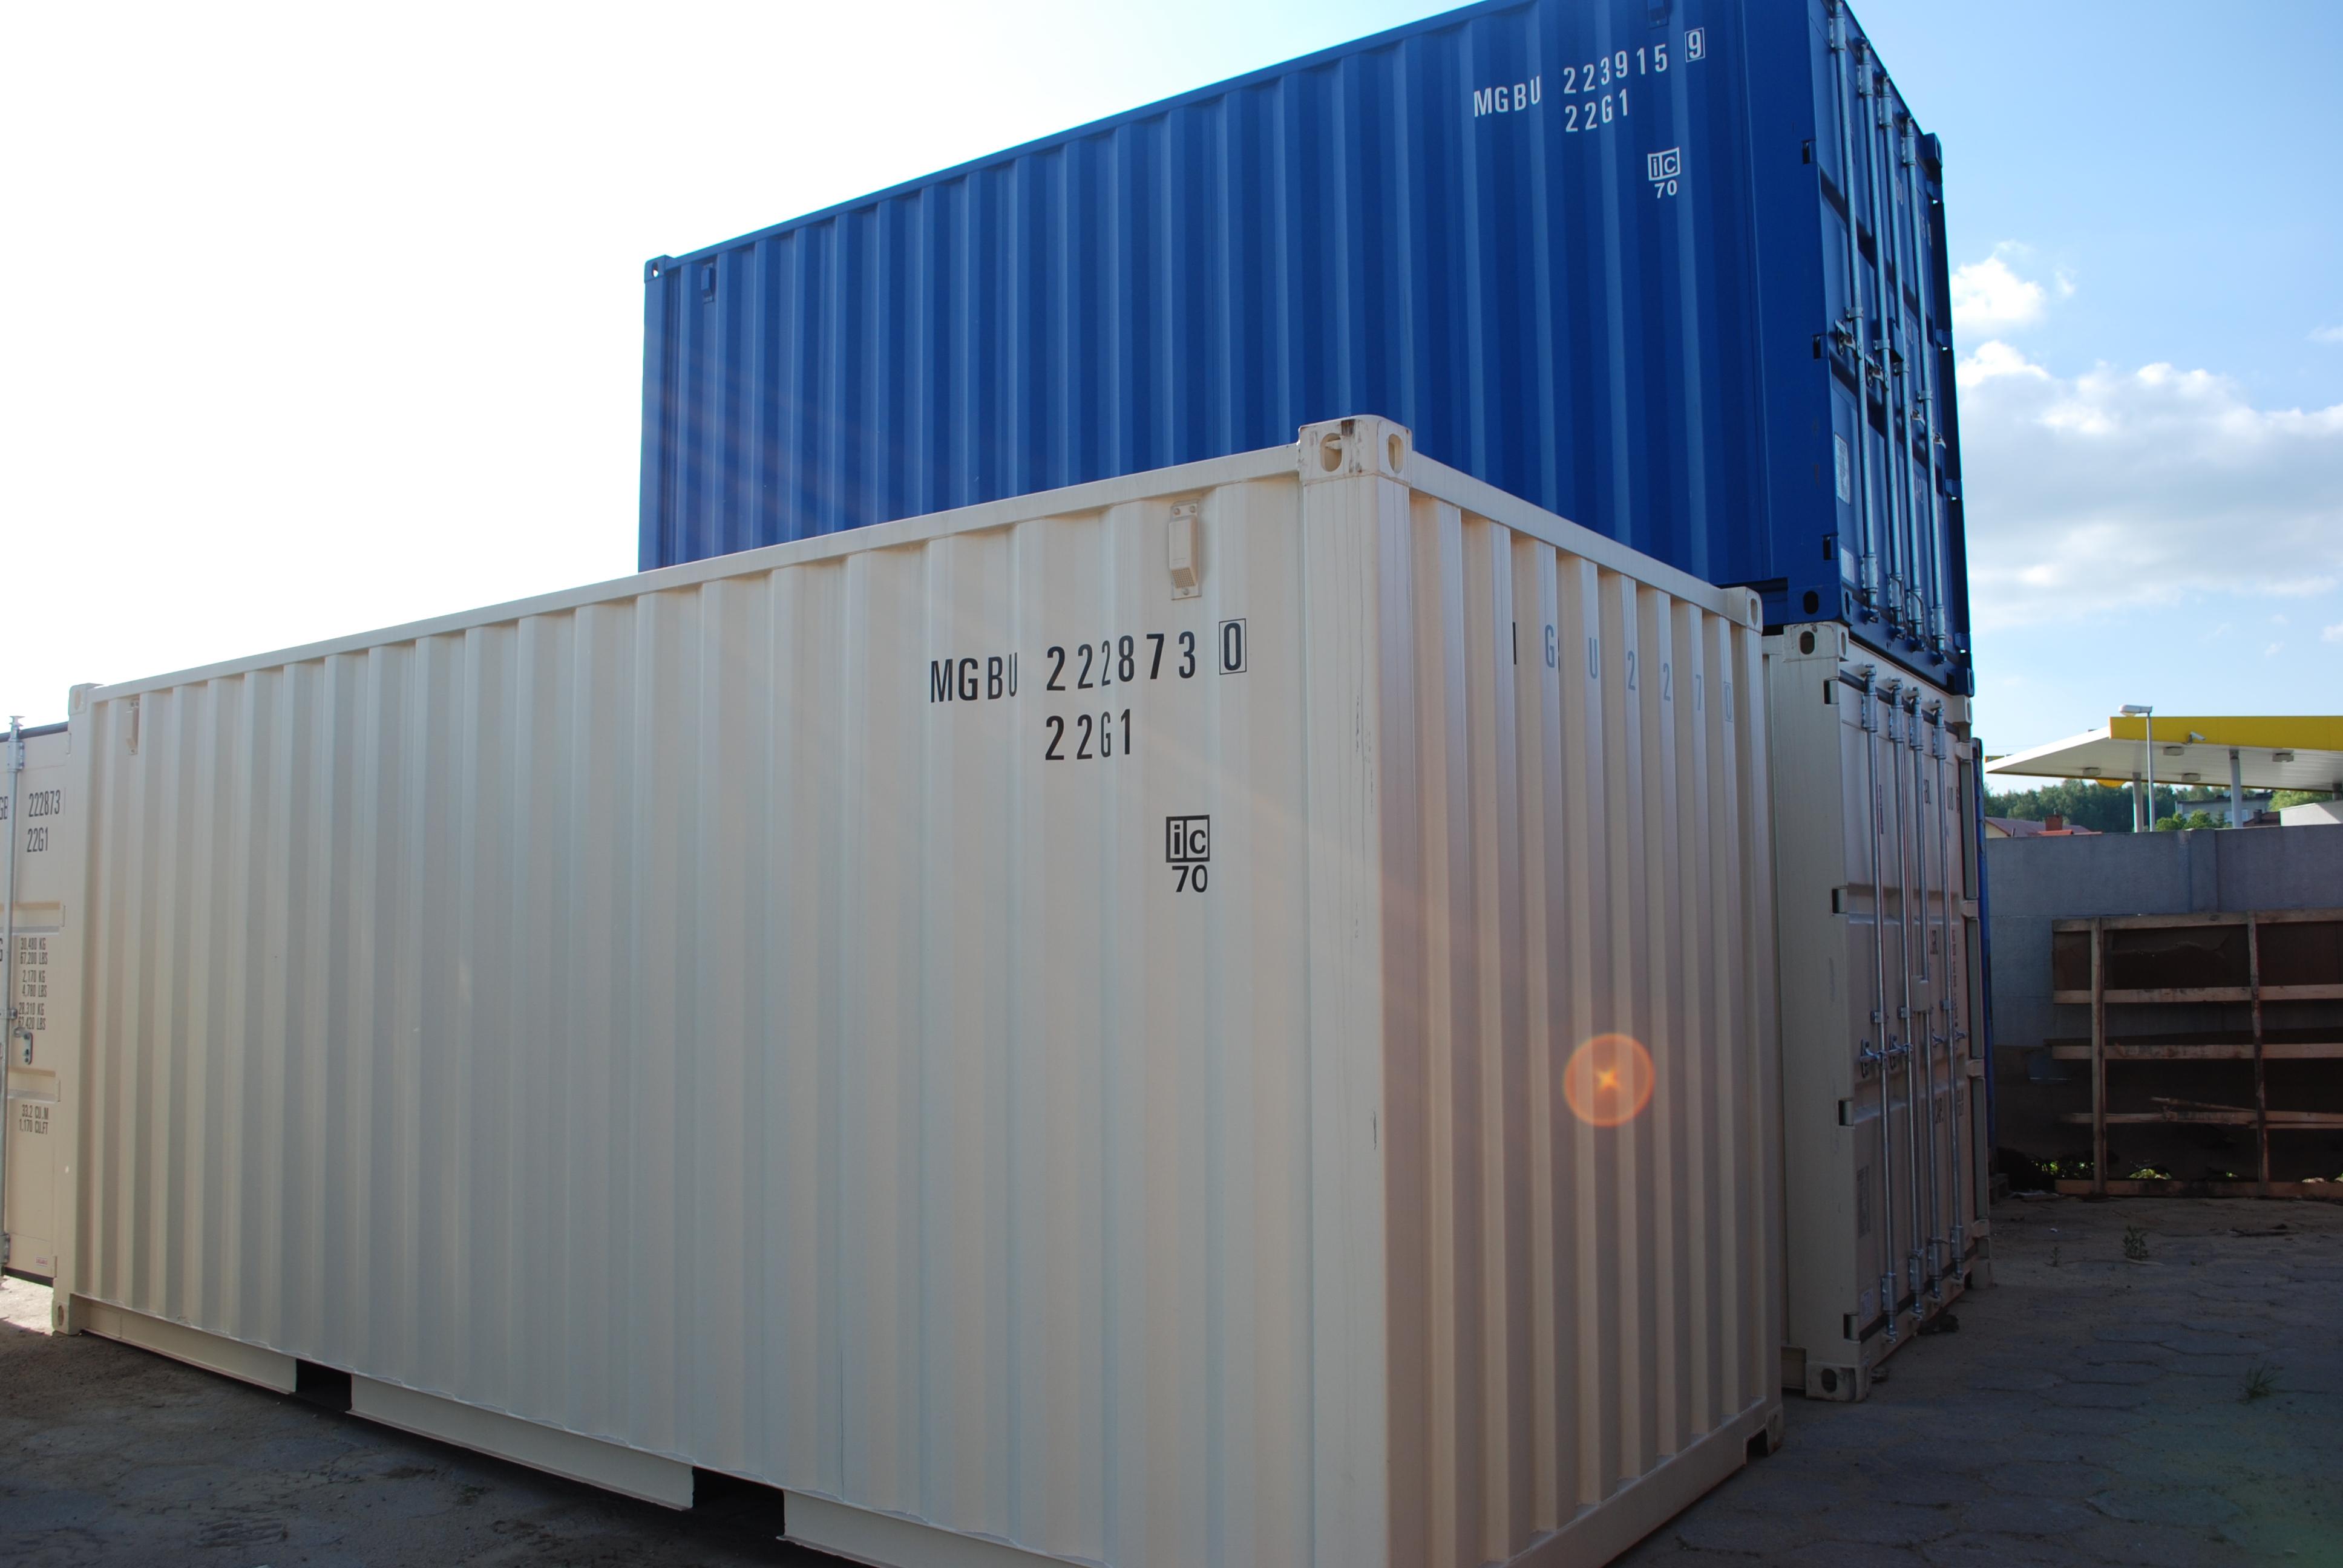 Machnik kontenery morskie nowe 10ft 20ft 40ft HC